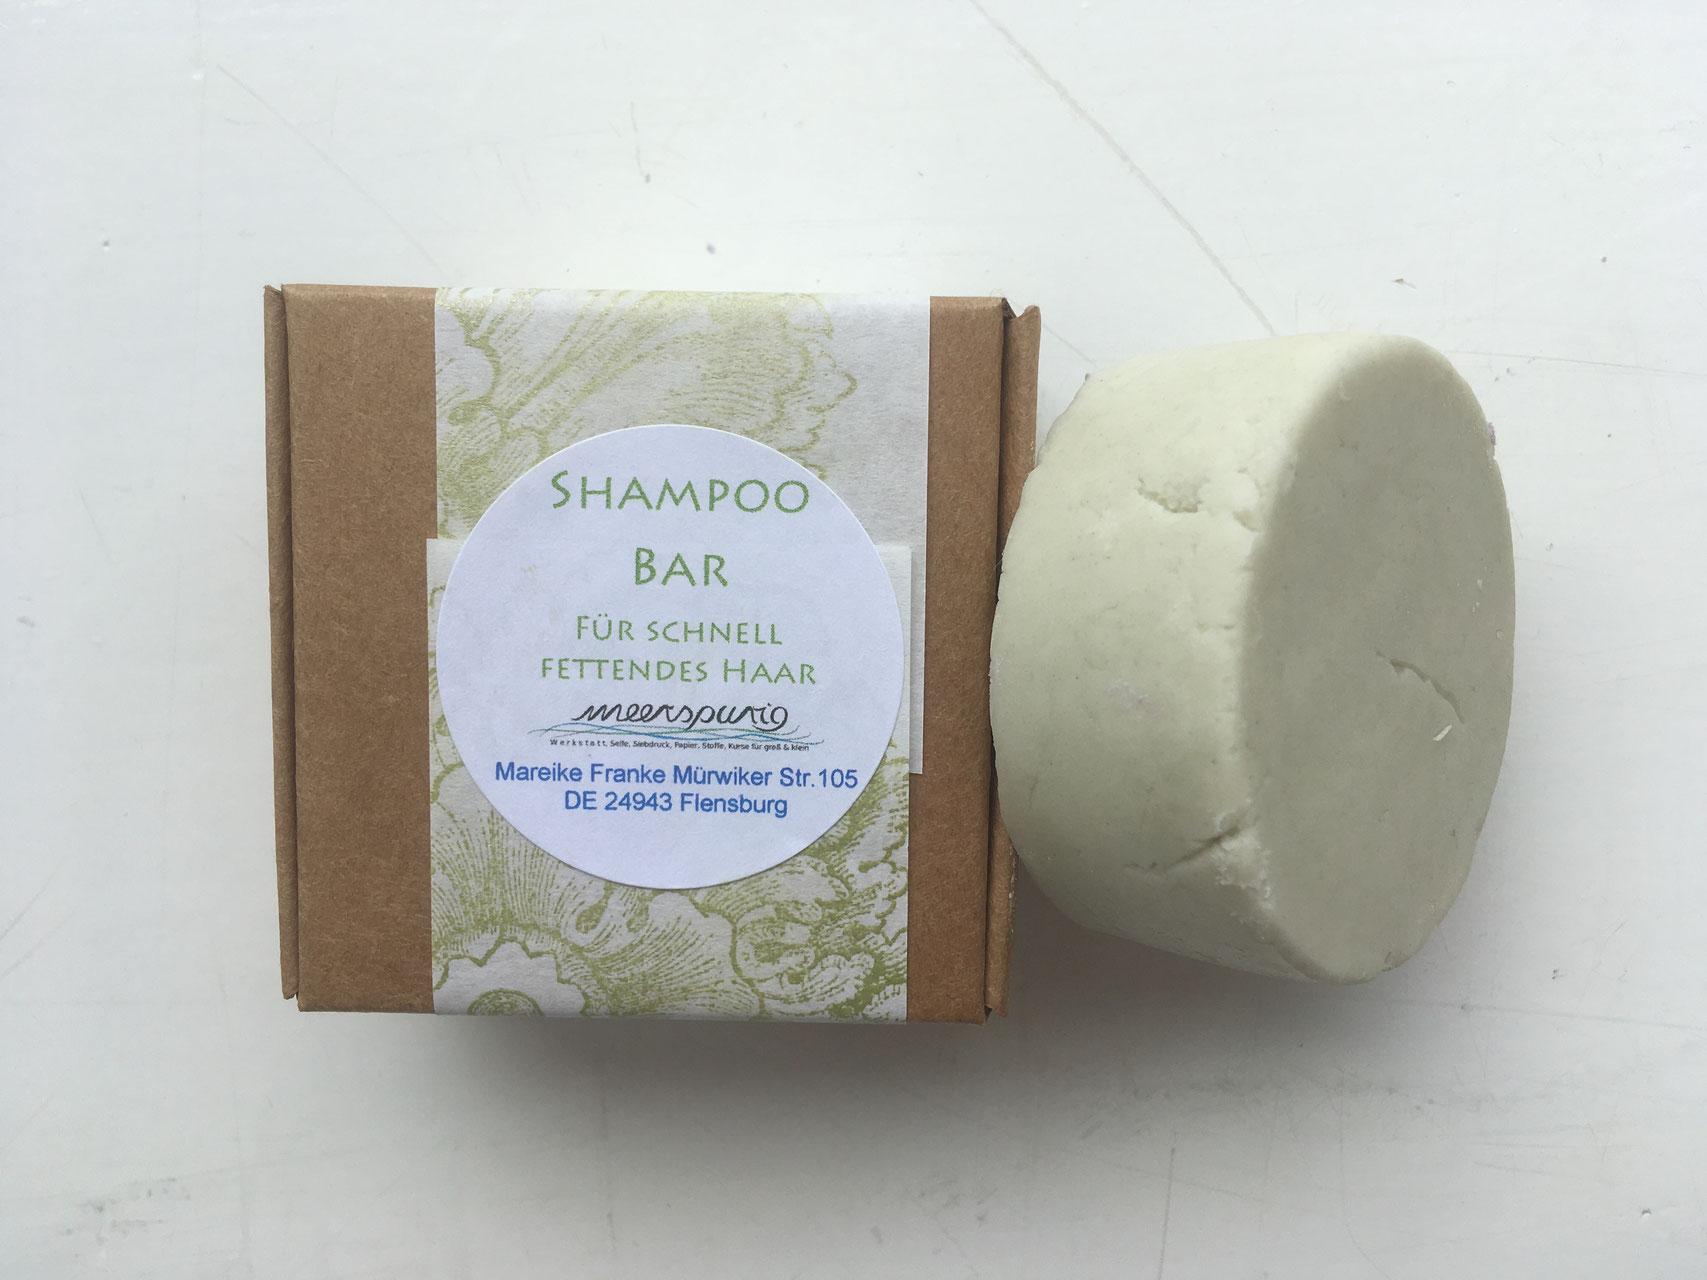 Shampoo Bars Meerspurig Handgemachte Seife Handgedruckte